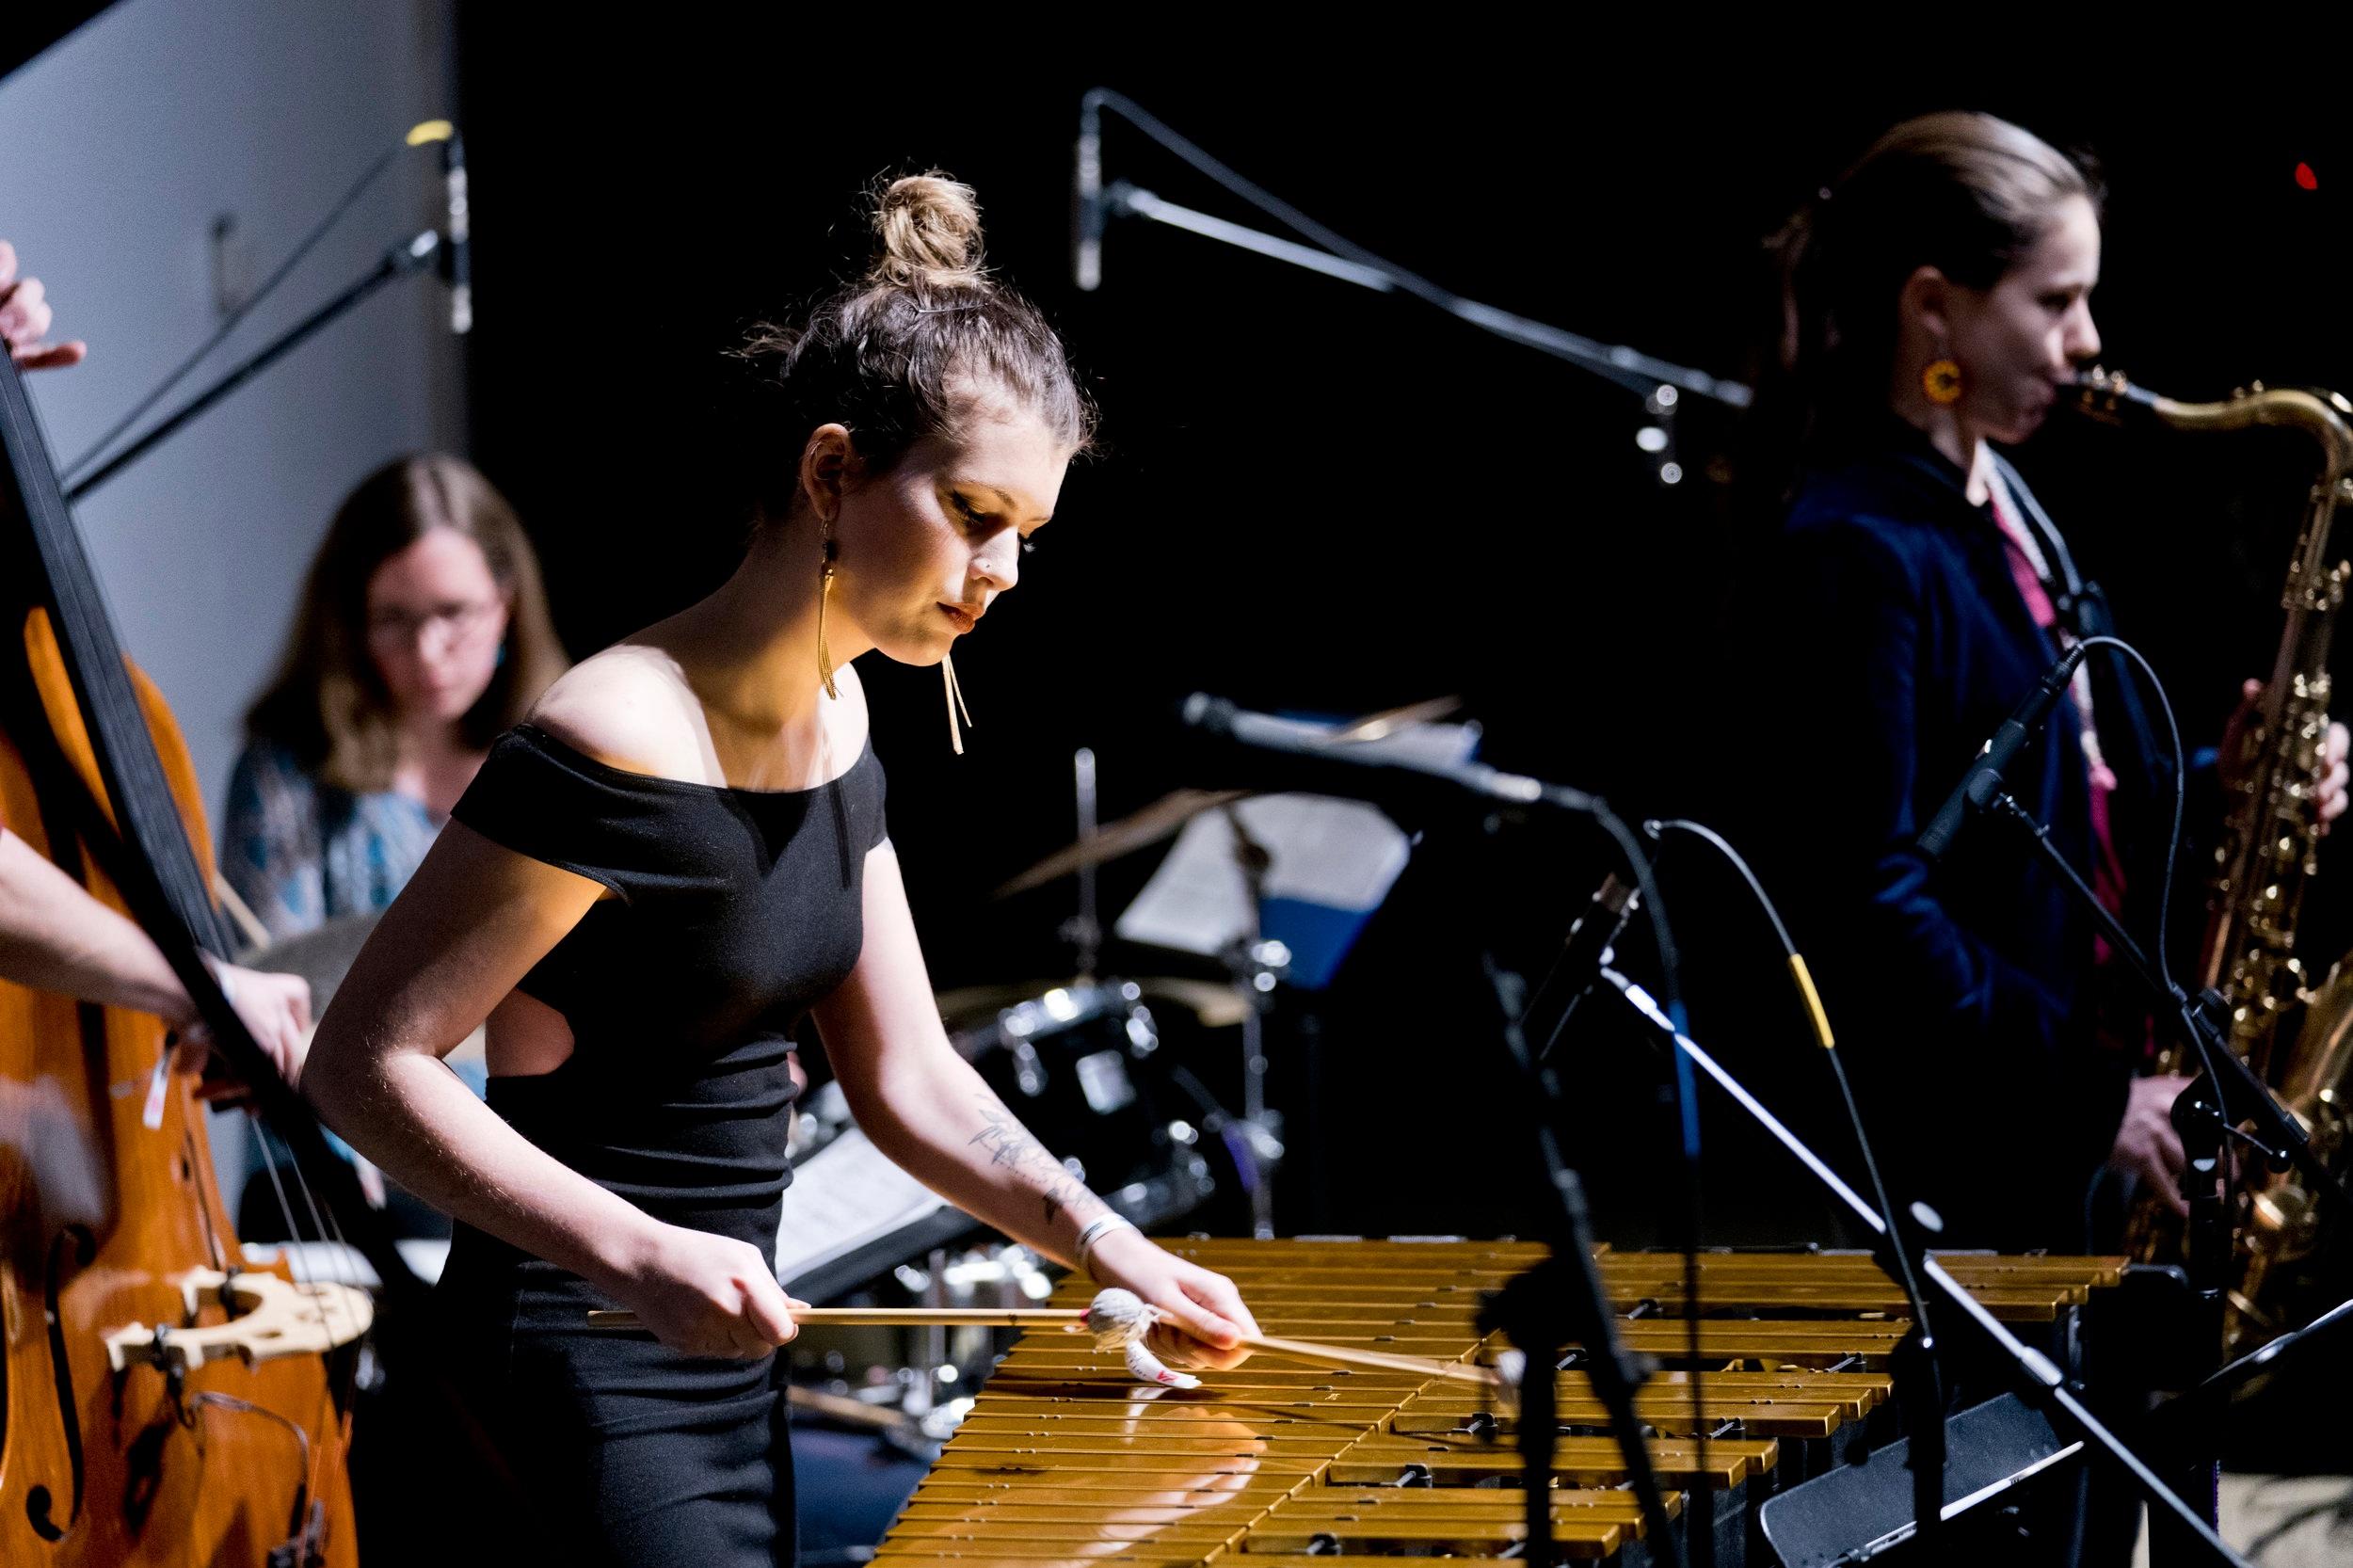 Sasha Berliner Quintet @NYC Winter Jazz Fest, 2018.  New York, NY.  John Rogers Photography.